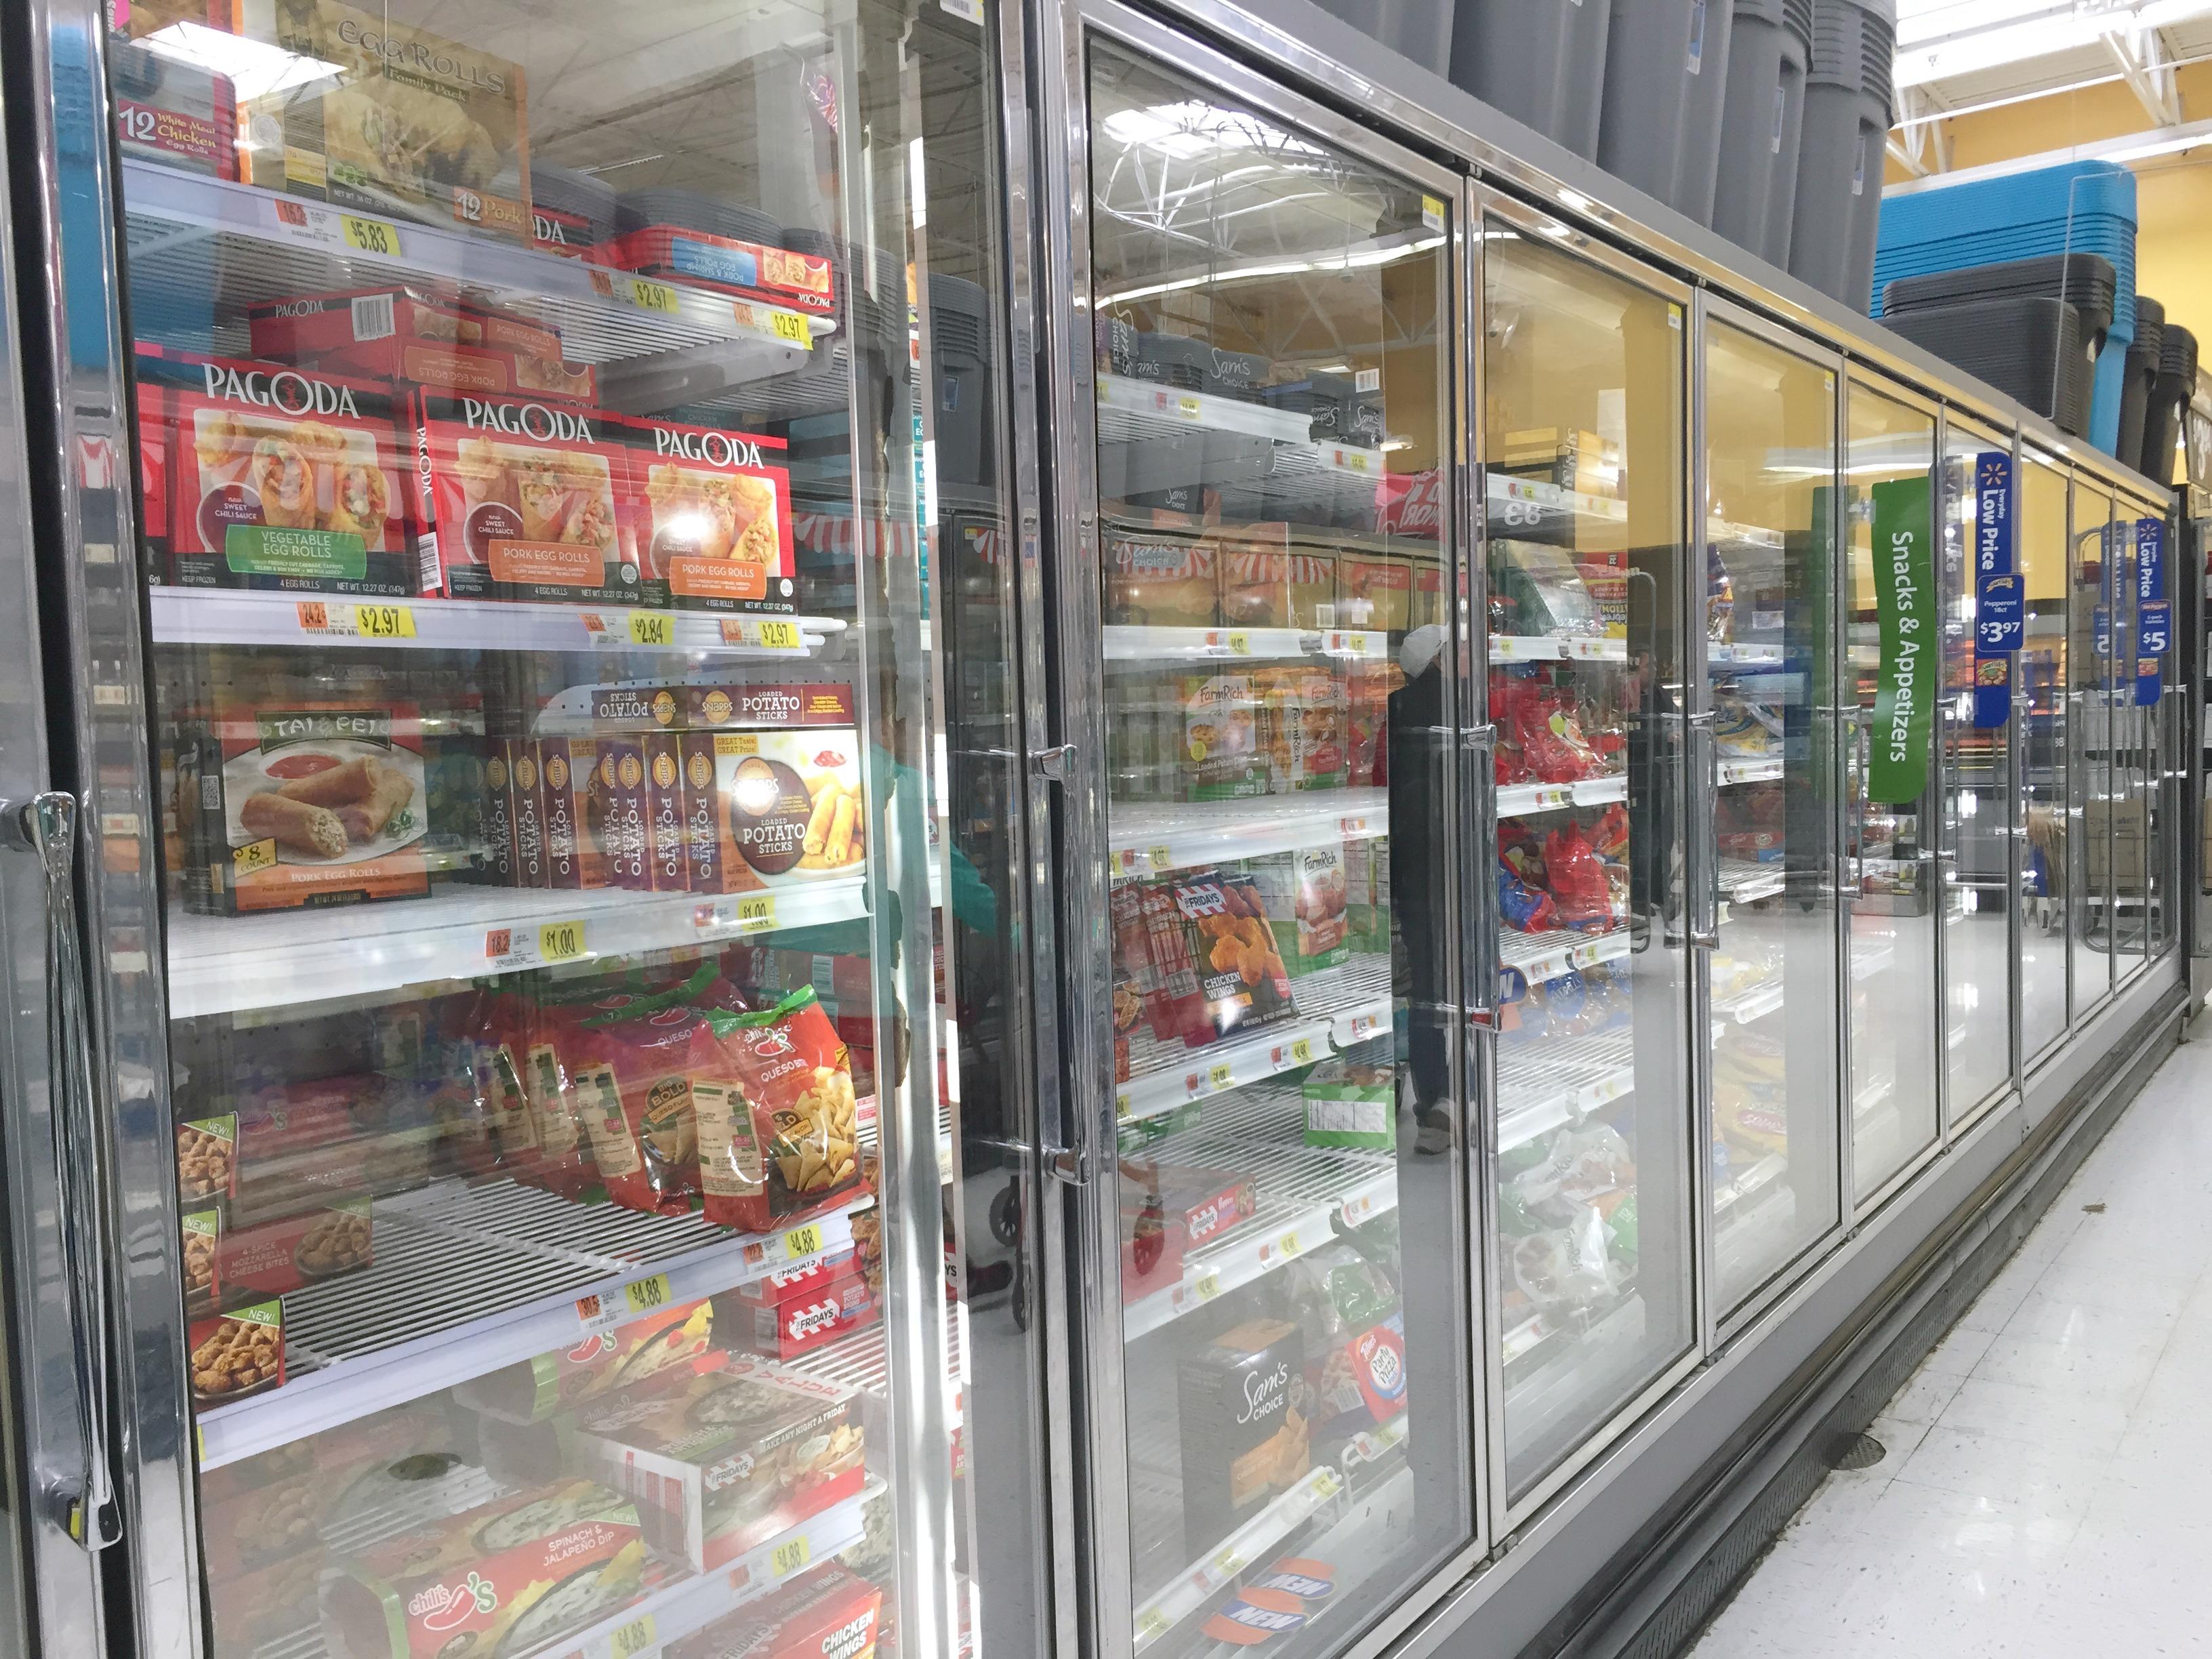 Walmart freezer aisle